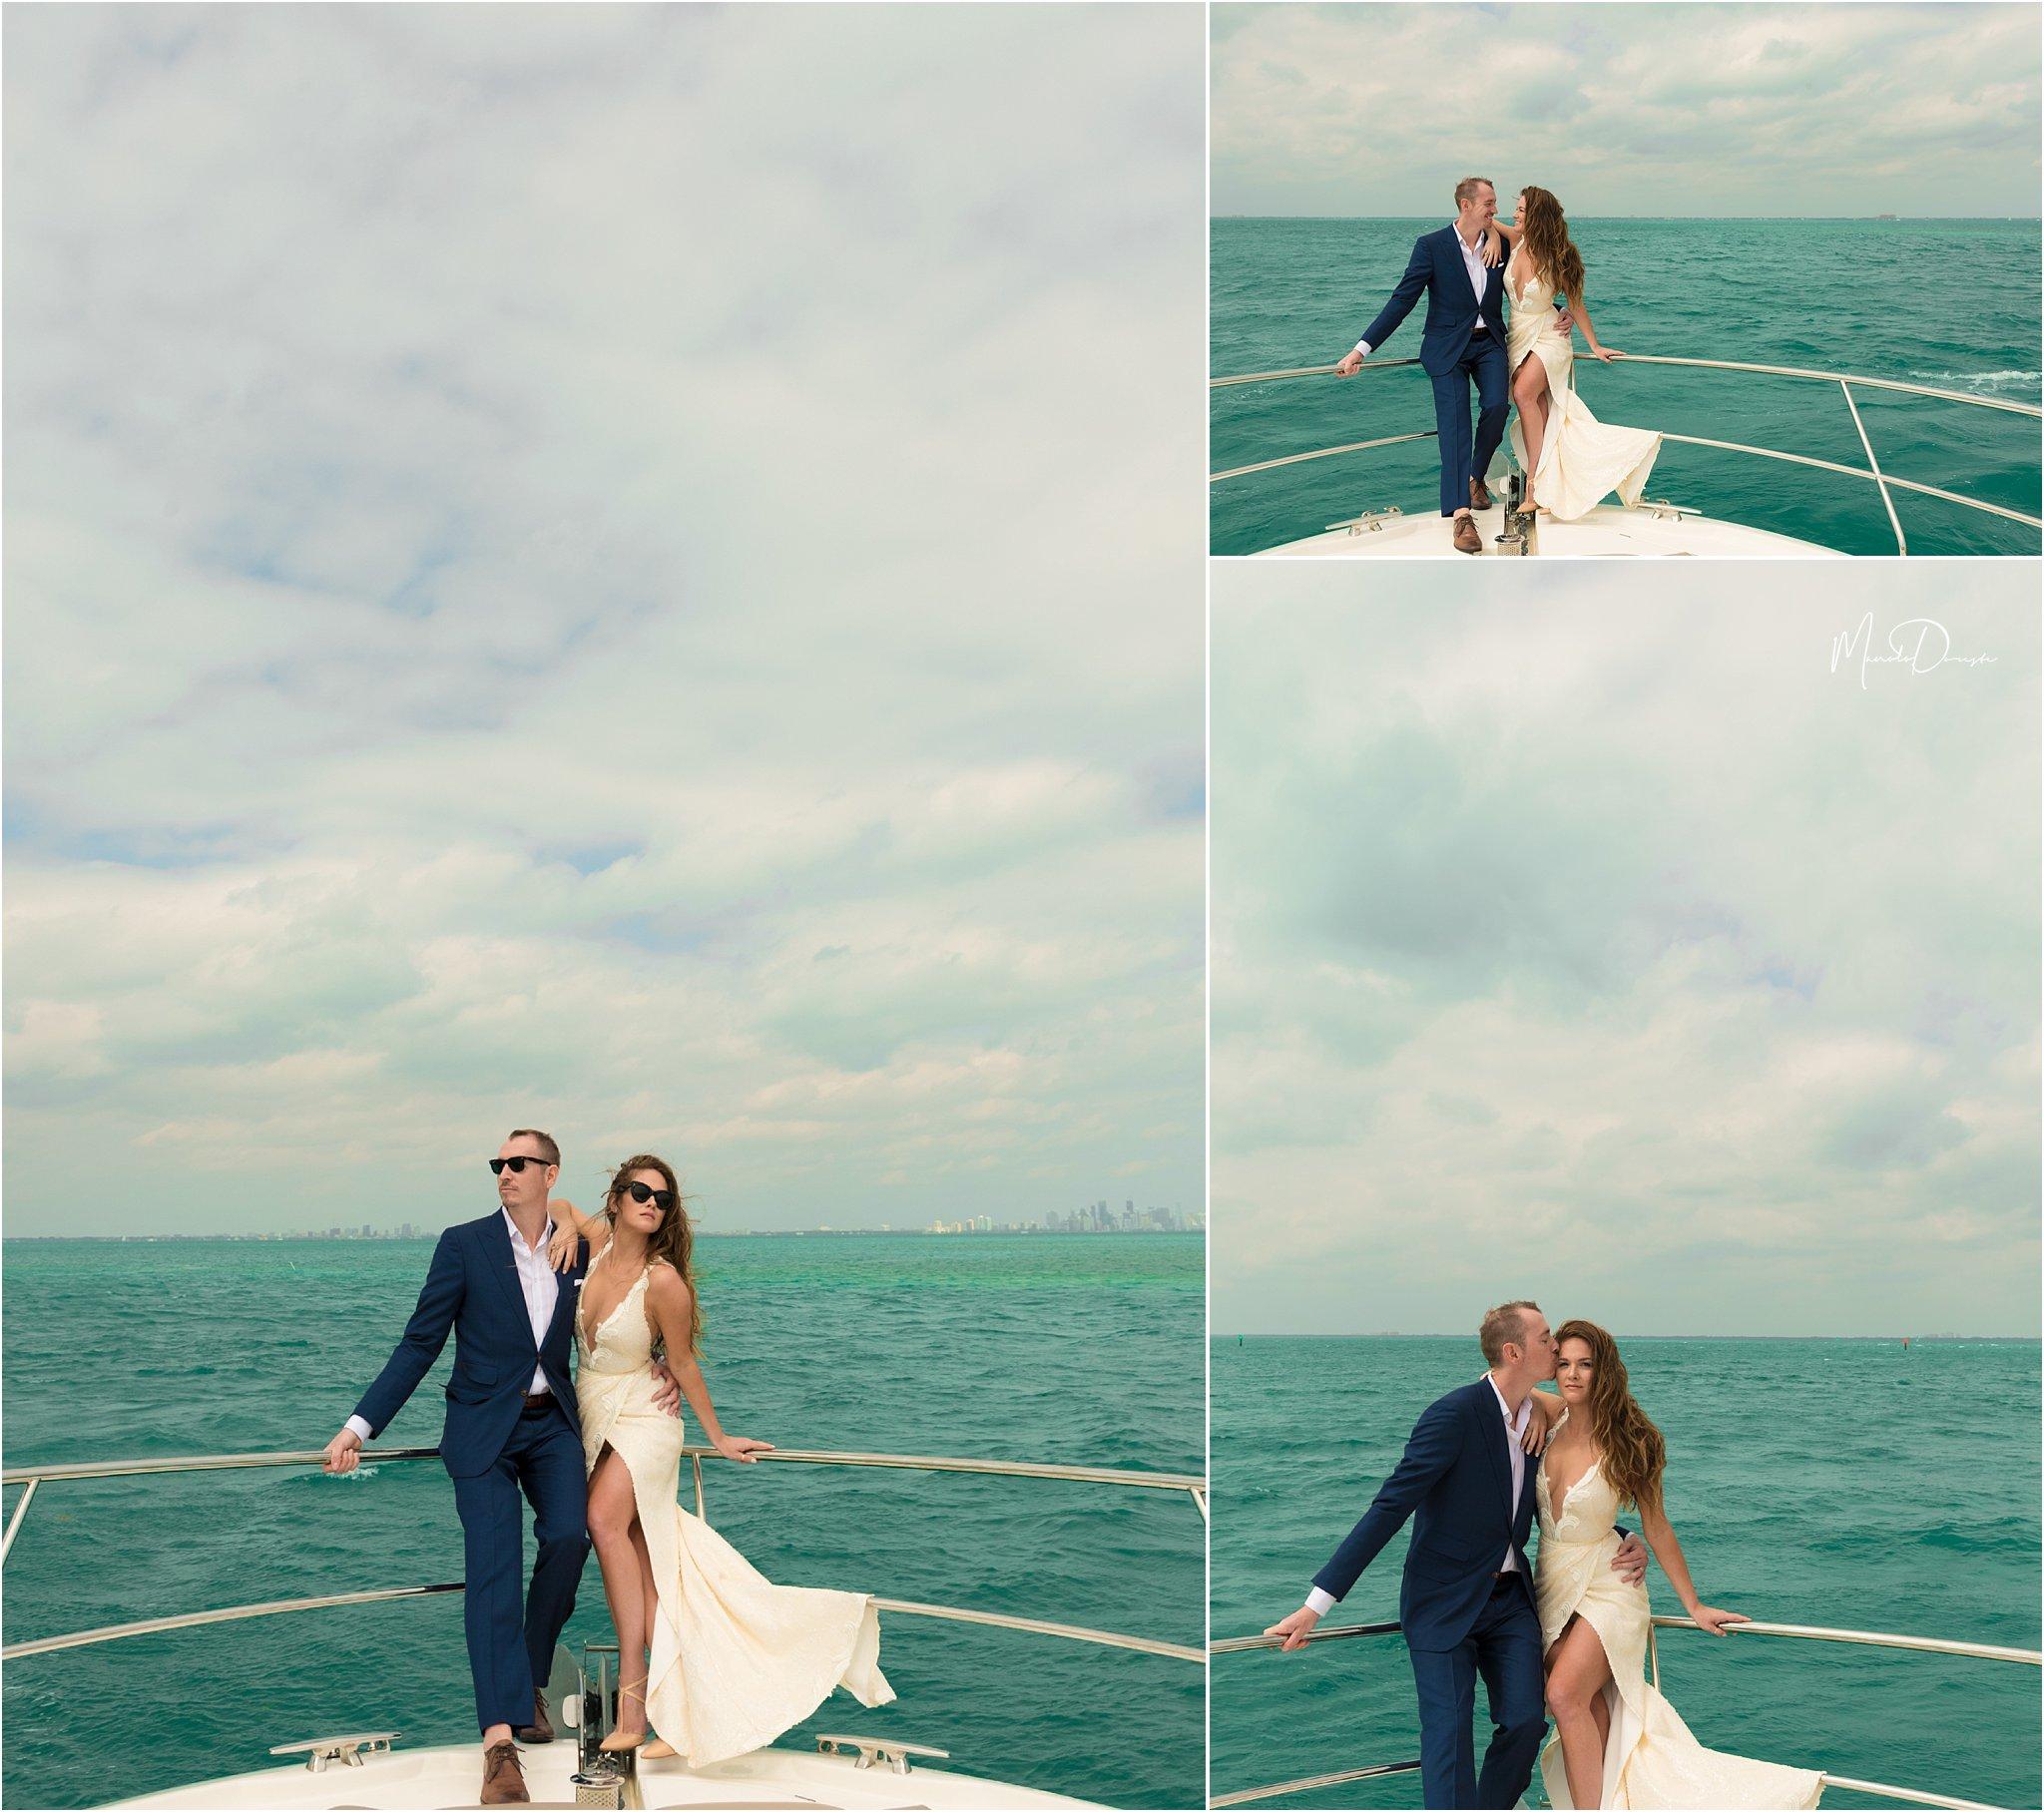 00897_ManoloDoreste_InFocusStudios_Wedding_Family_Photography_Miami_MiamiPhotographer.jpg